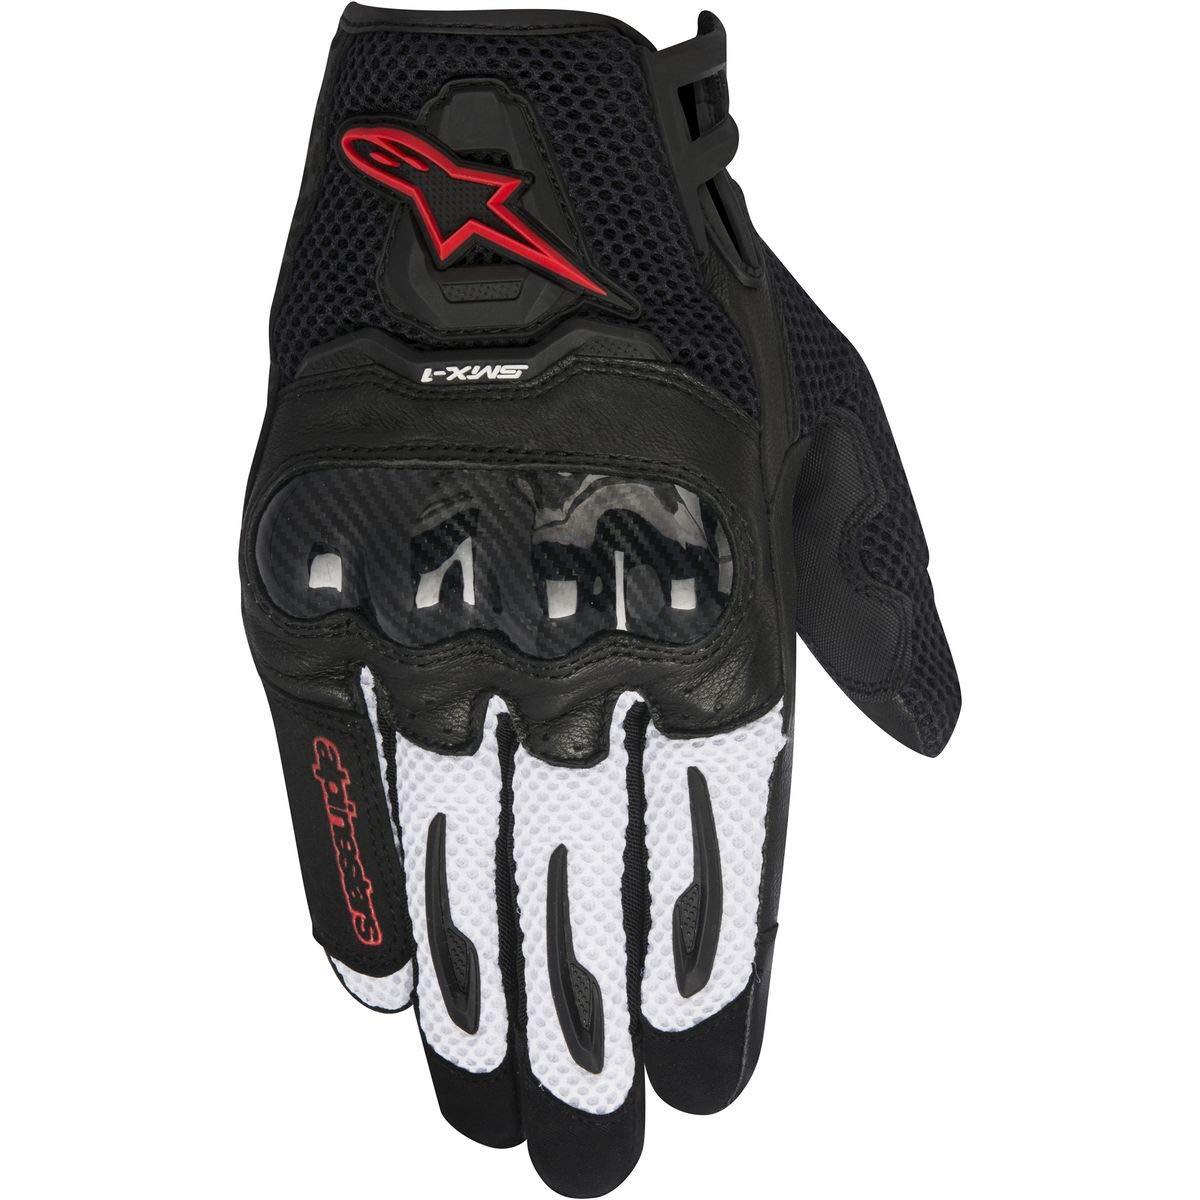 3301-2834 Alpinestars Unisex Adult Gloves Black//Red Small